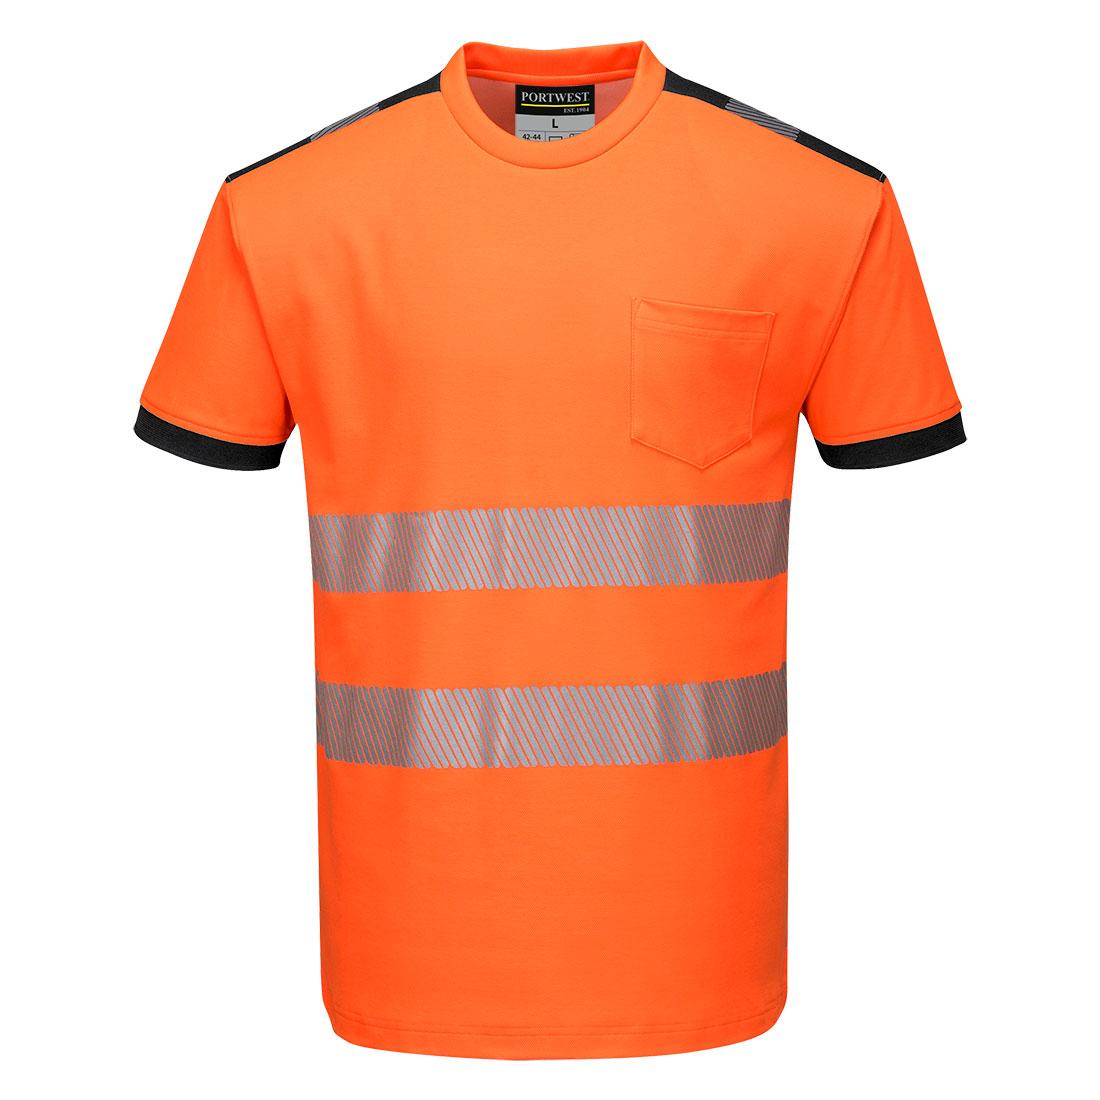 PW3 Hi-Vis T-Shirt  S/S Orange/Black 4XLR